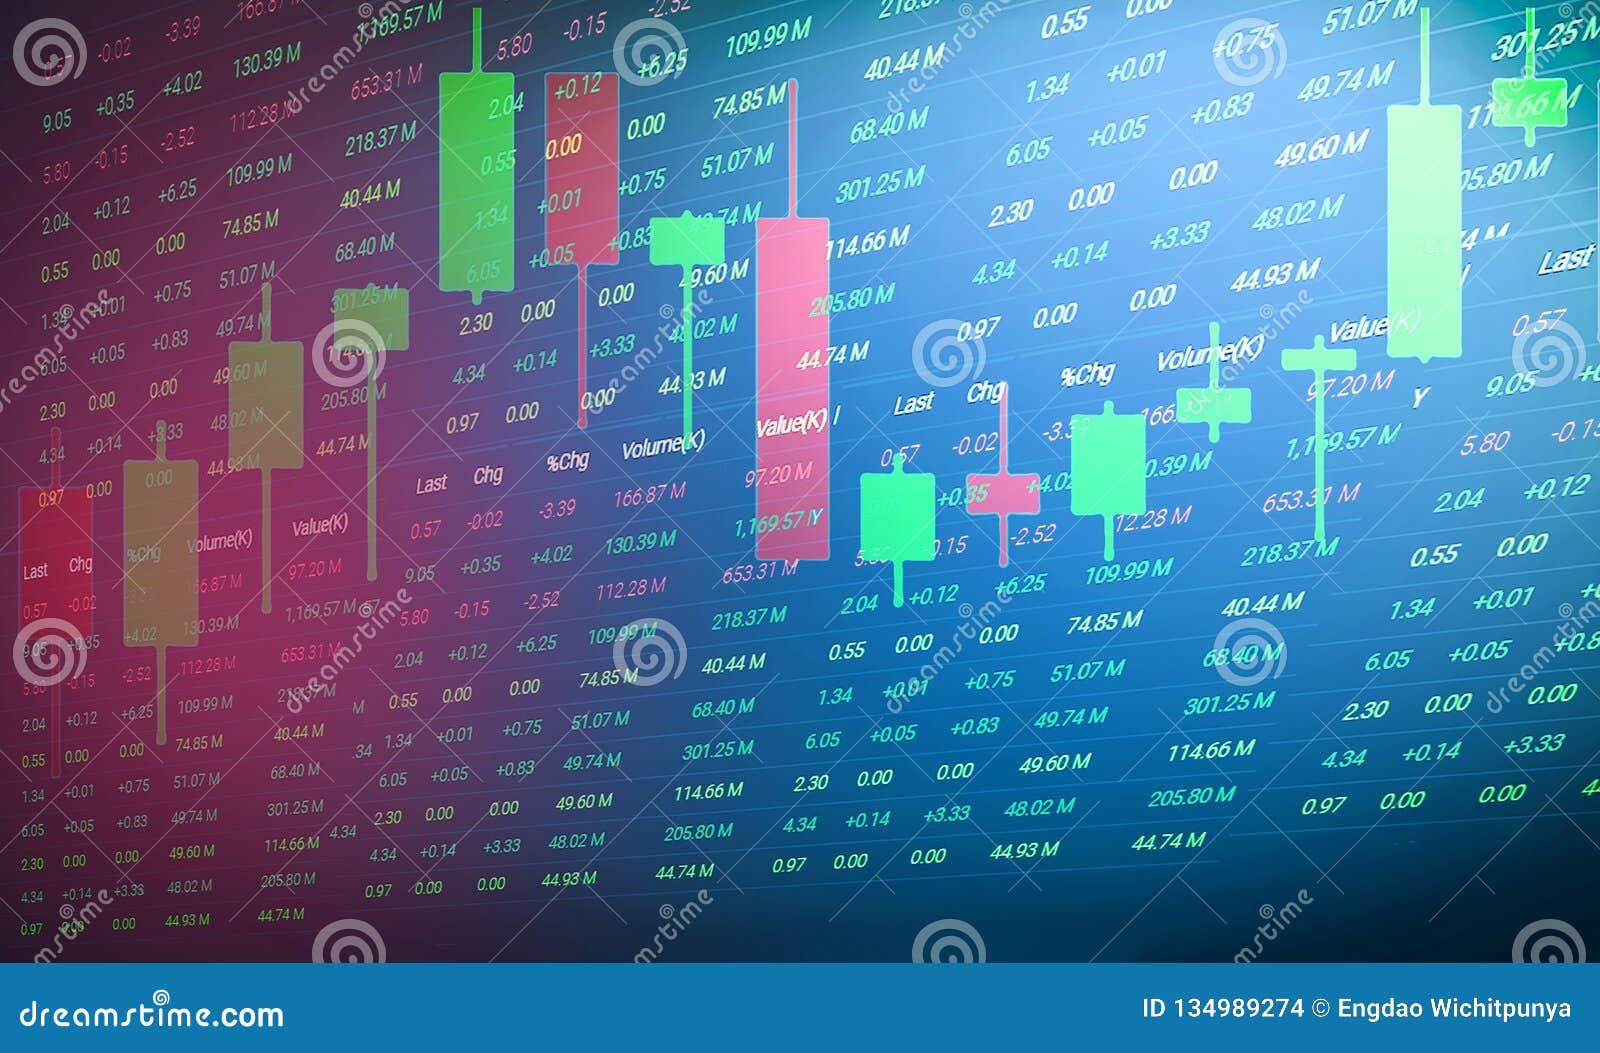 Календарь форекс investing прогноз форекс глеб задоя